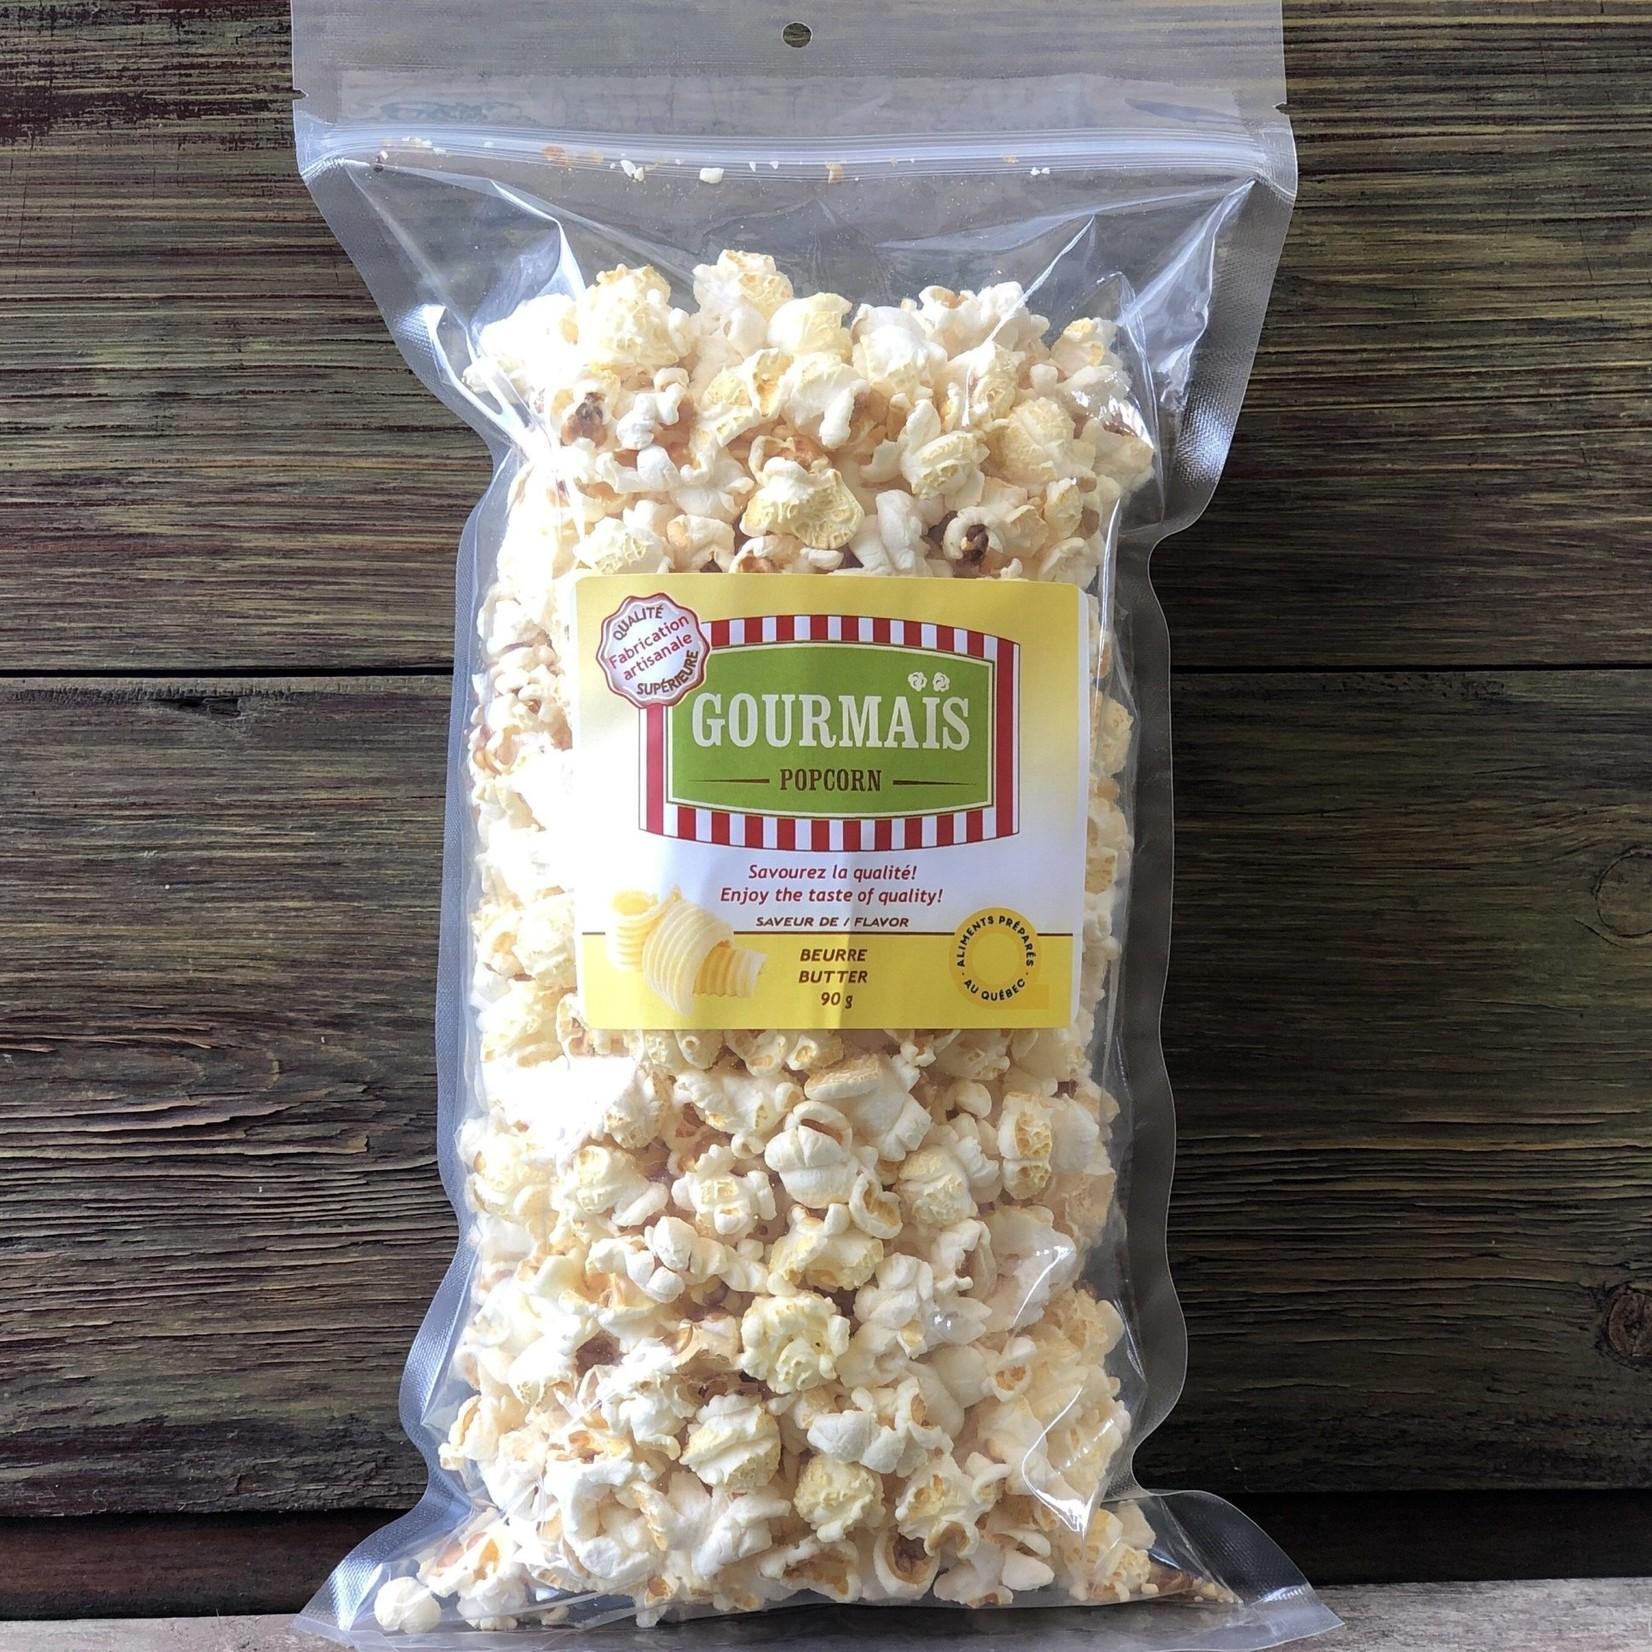 Popcorn Gourmais - Beurre